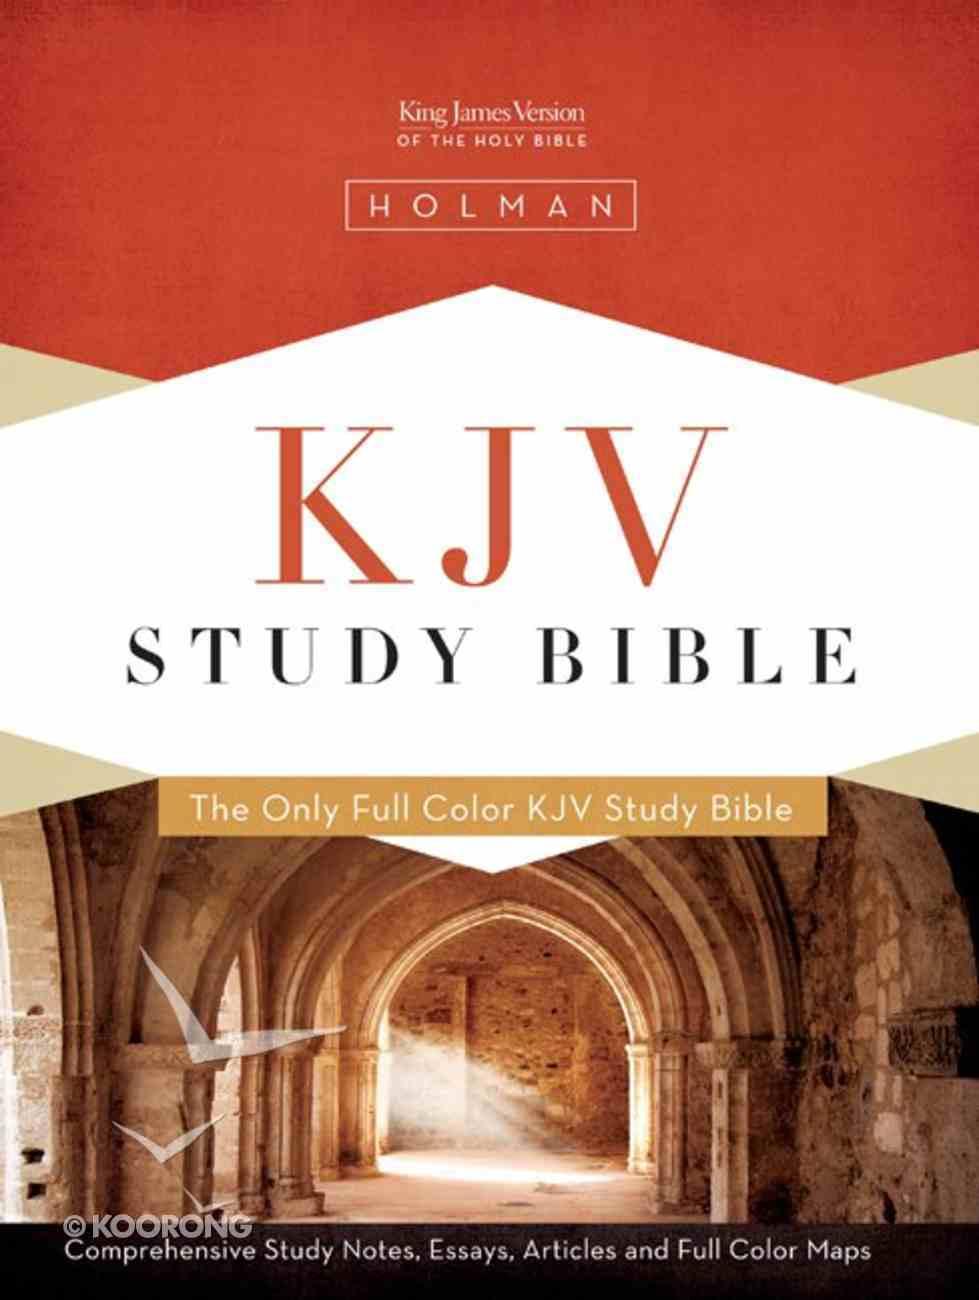 KJV Study Bible Simulated Leather Mantova Brown (Indexed) Imitation Leather